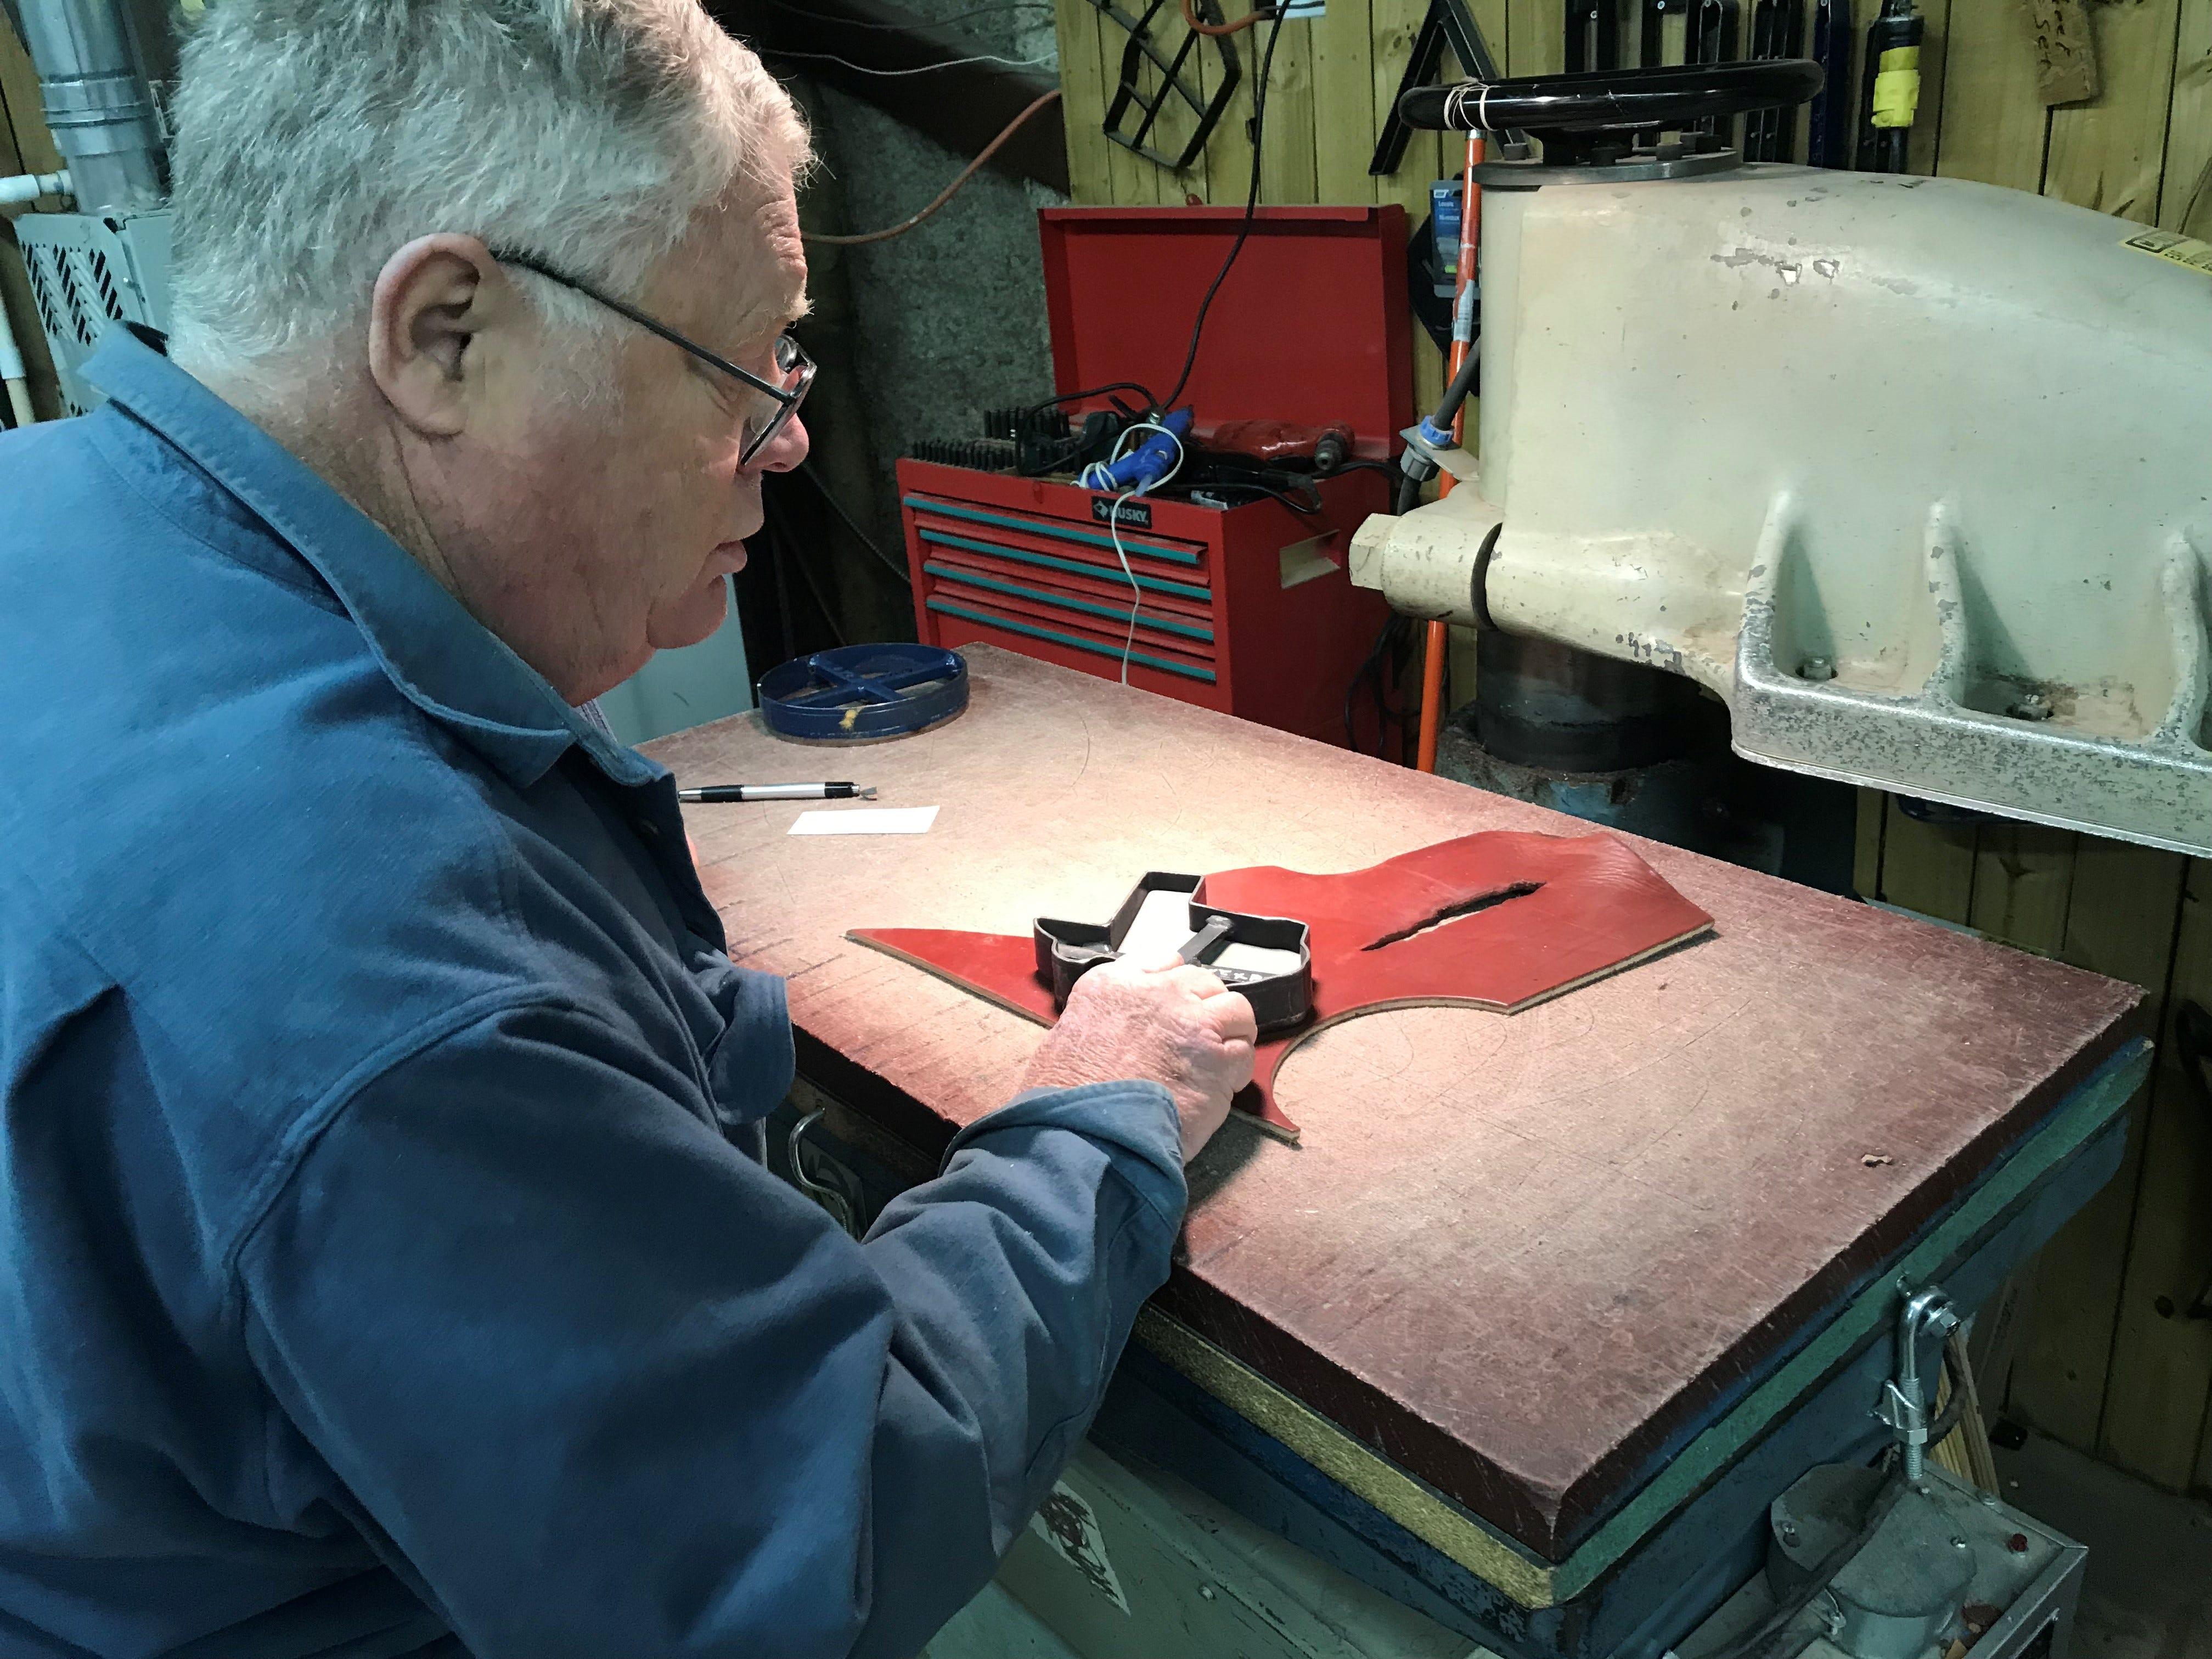 Nils Shawn Pascuzzi cuts leather at Shawn's Custom Saddles and Tacks, 6581 Sykes Circle. Photo taken Jan. 2, 2019.